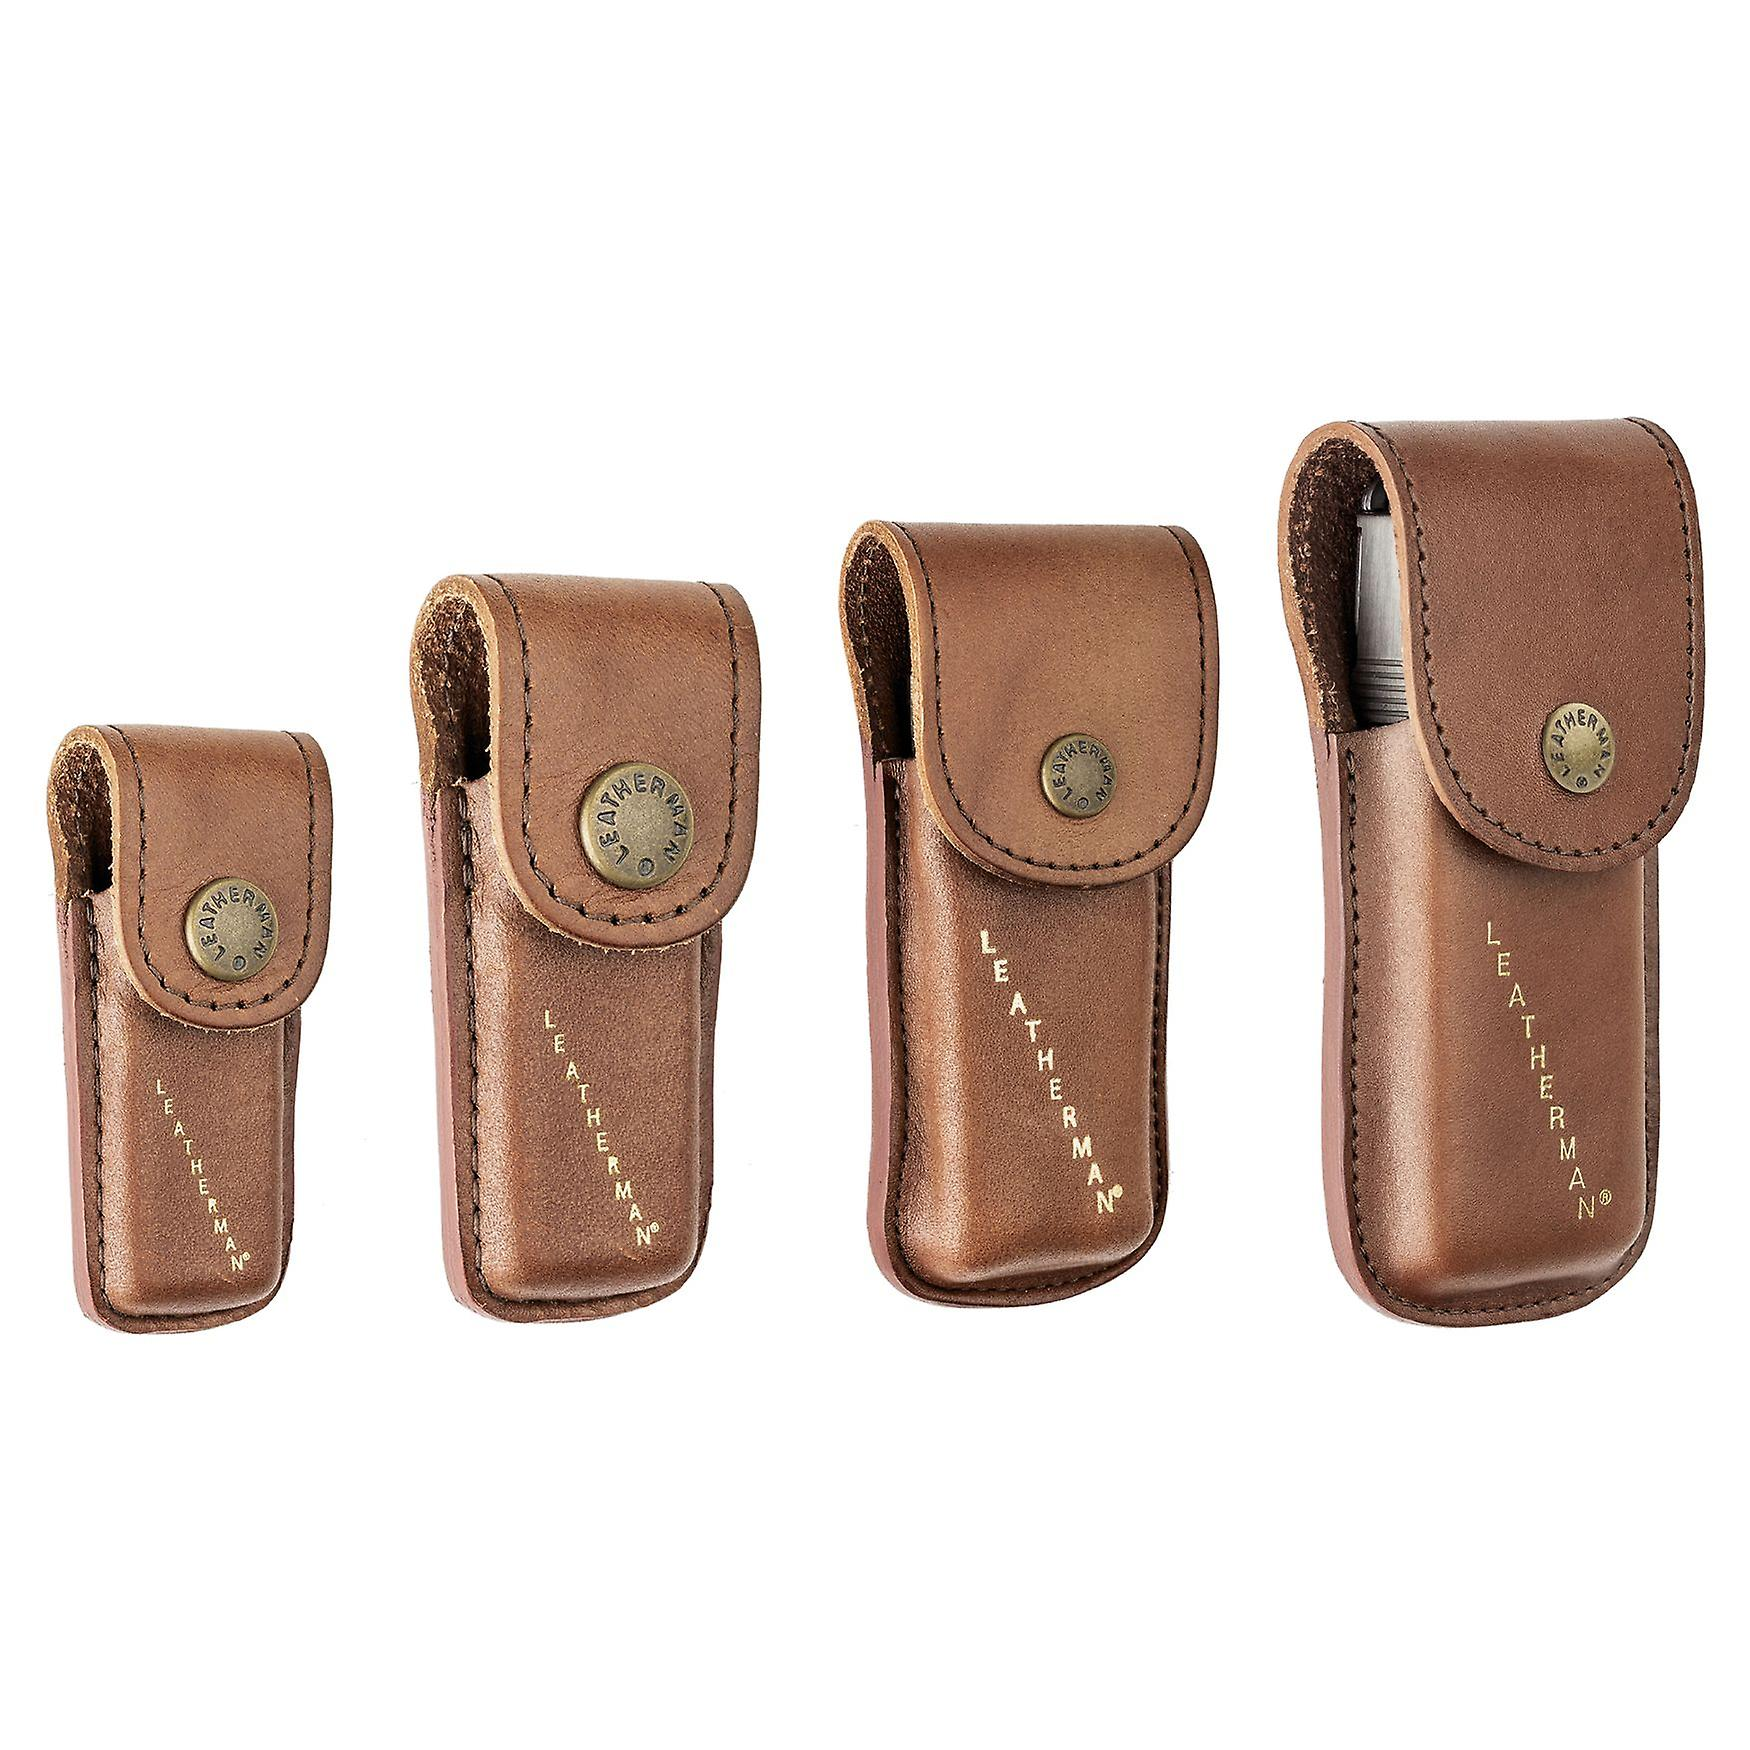 Echte Leatherman Heritage Mantel - Ledertaschen für Leatherman Multi-Tools